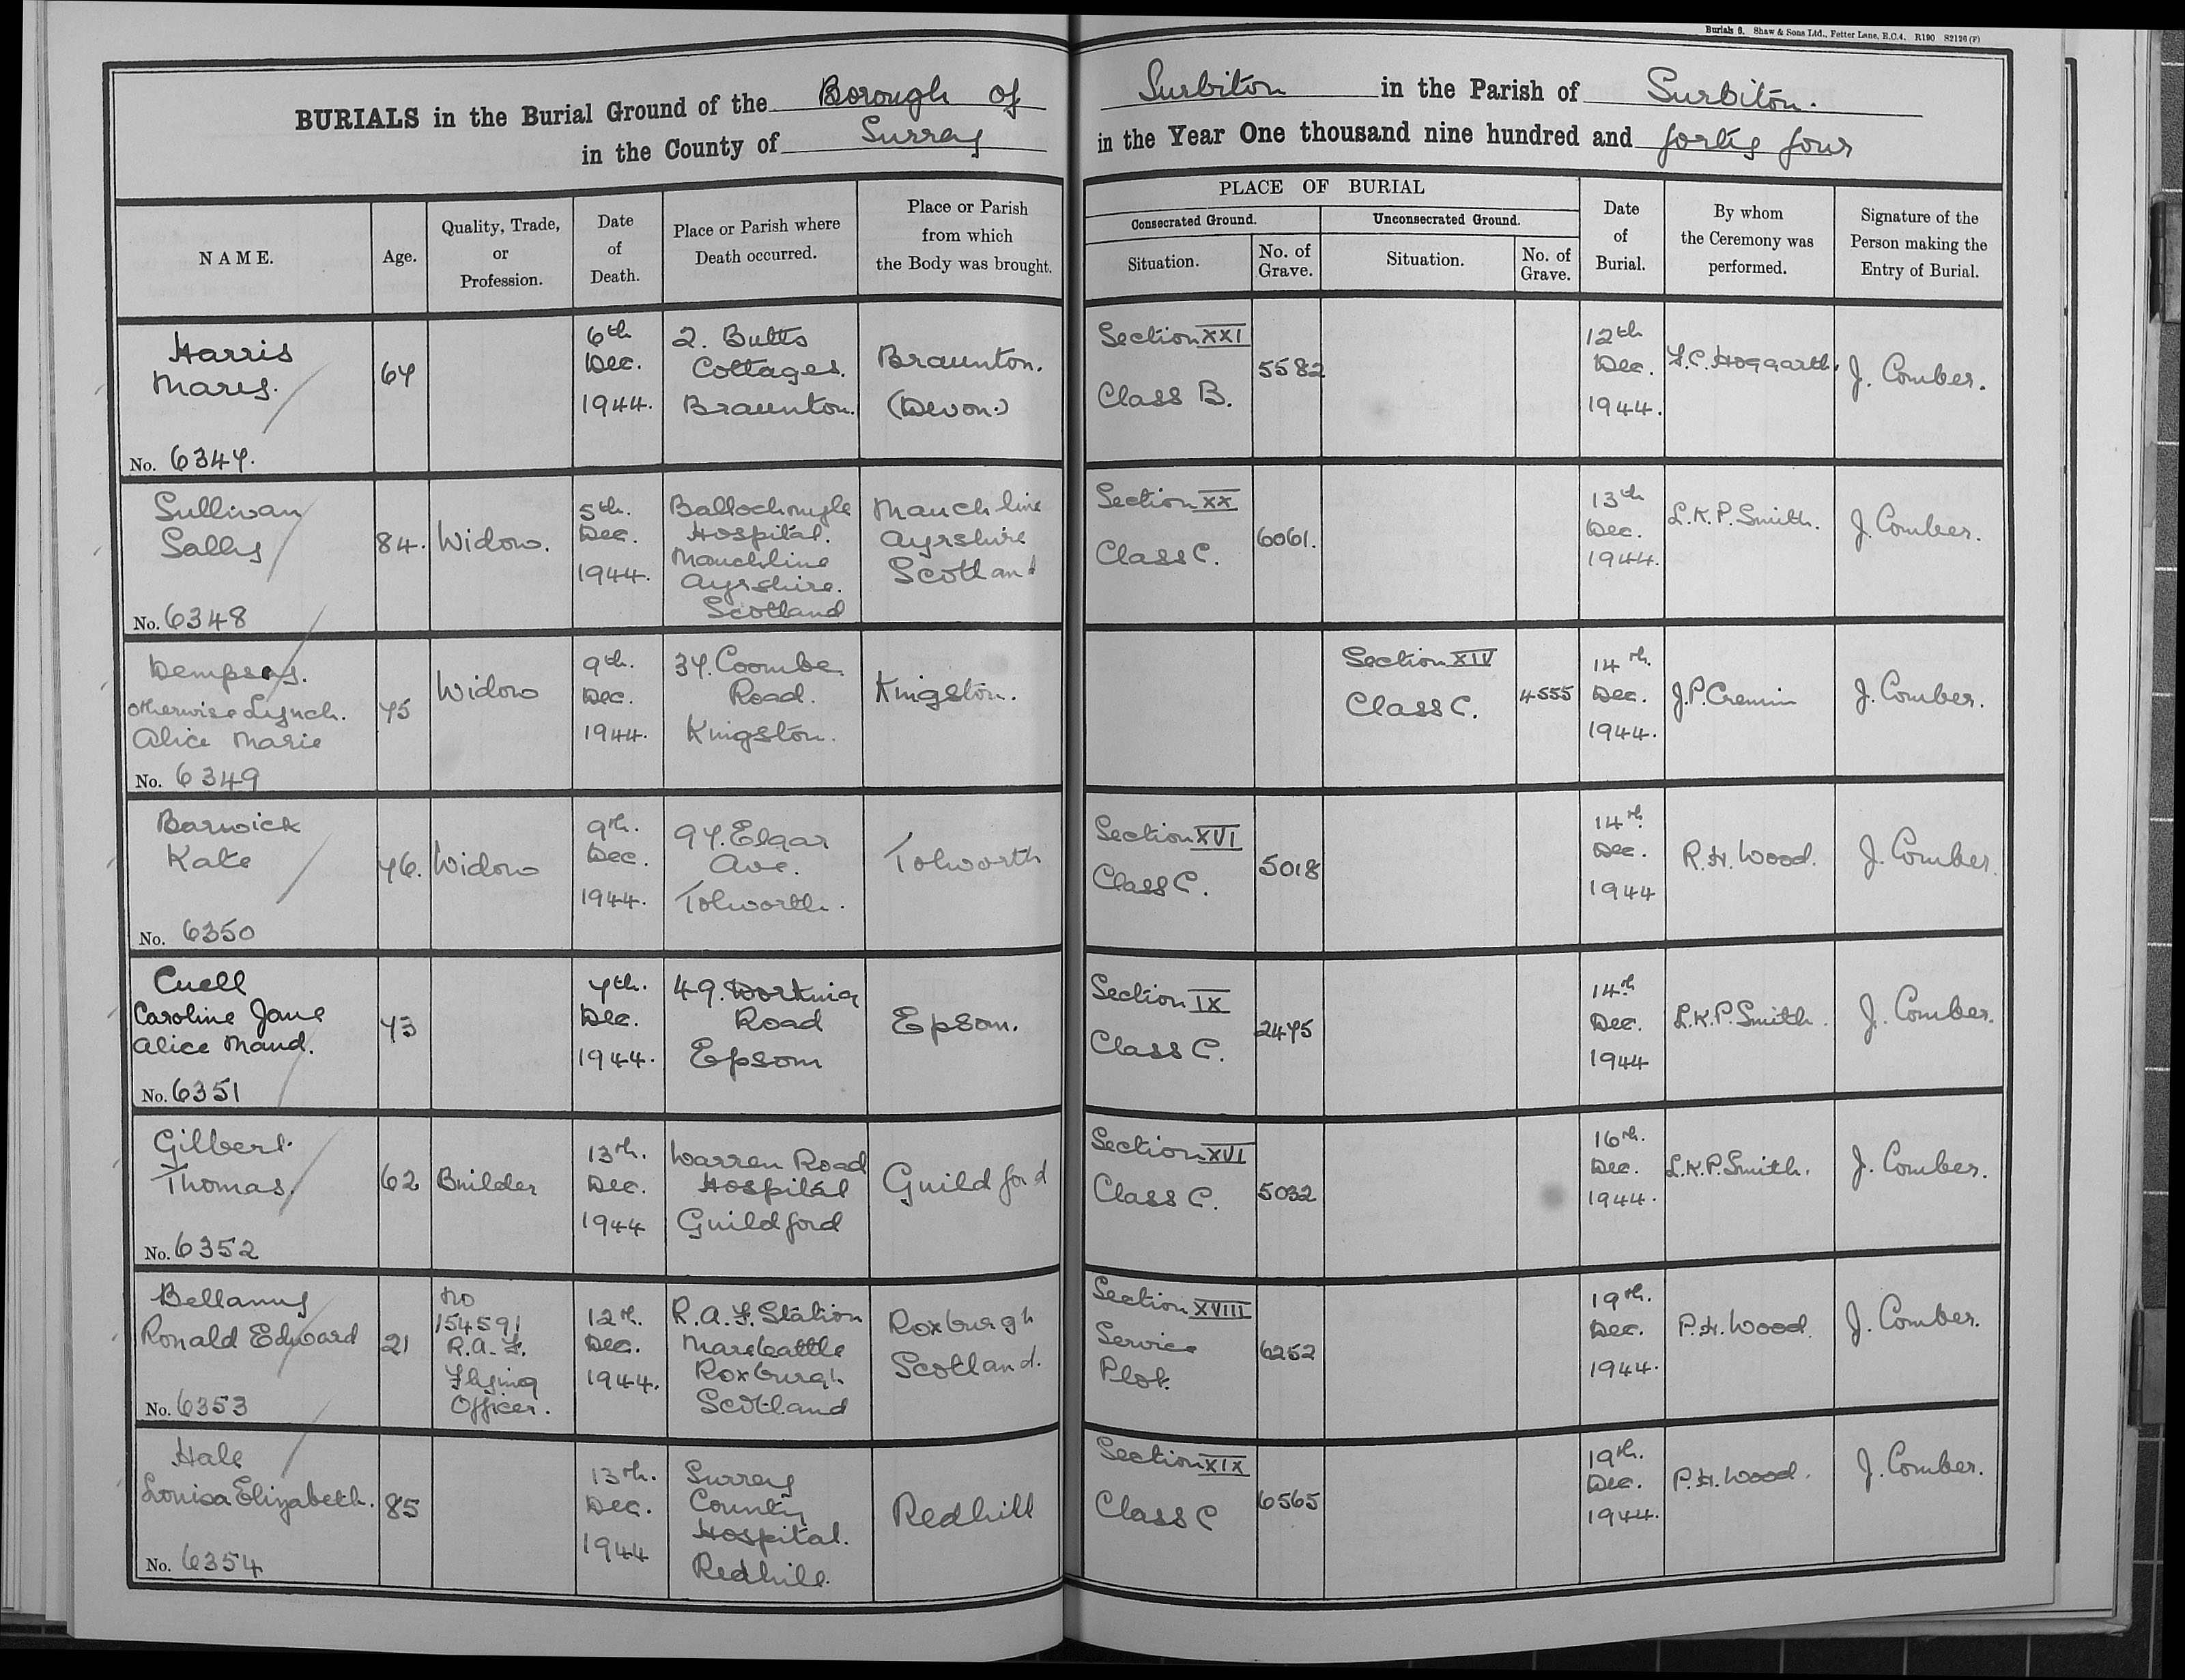 Burial records - Gilbert, Thomas | The Royal Borough of